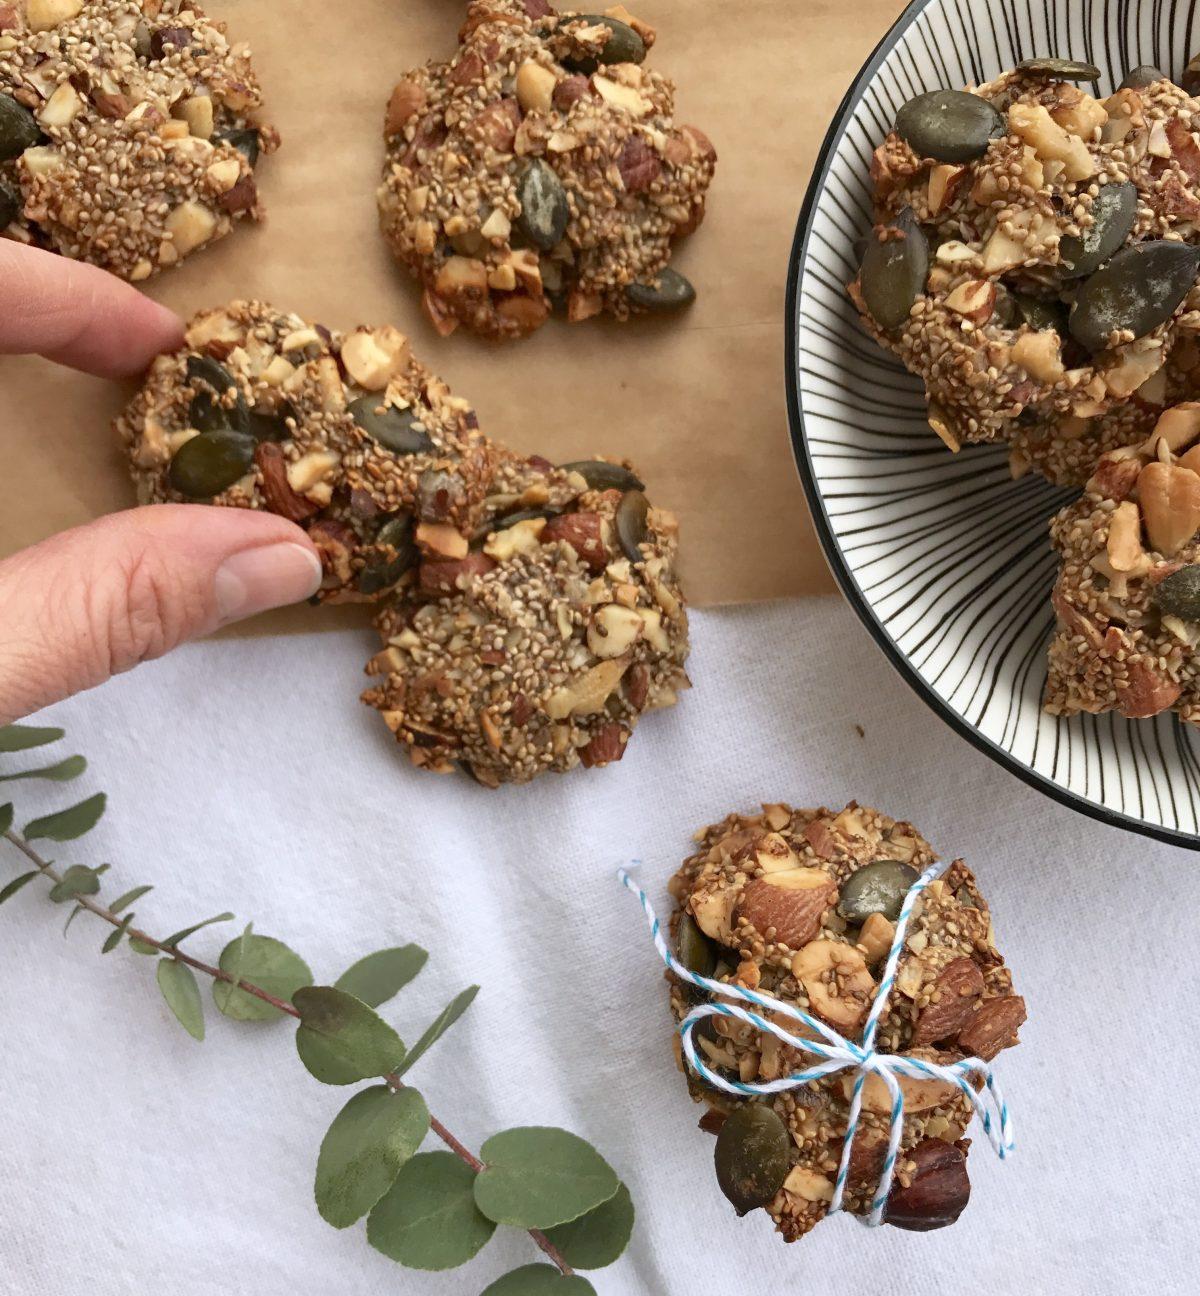 Vegane Müsli-Cracker mit Kürbiskernen | Berlinmittemom.com